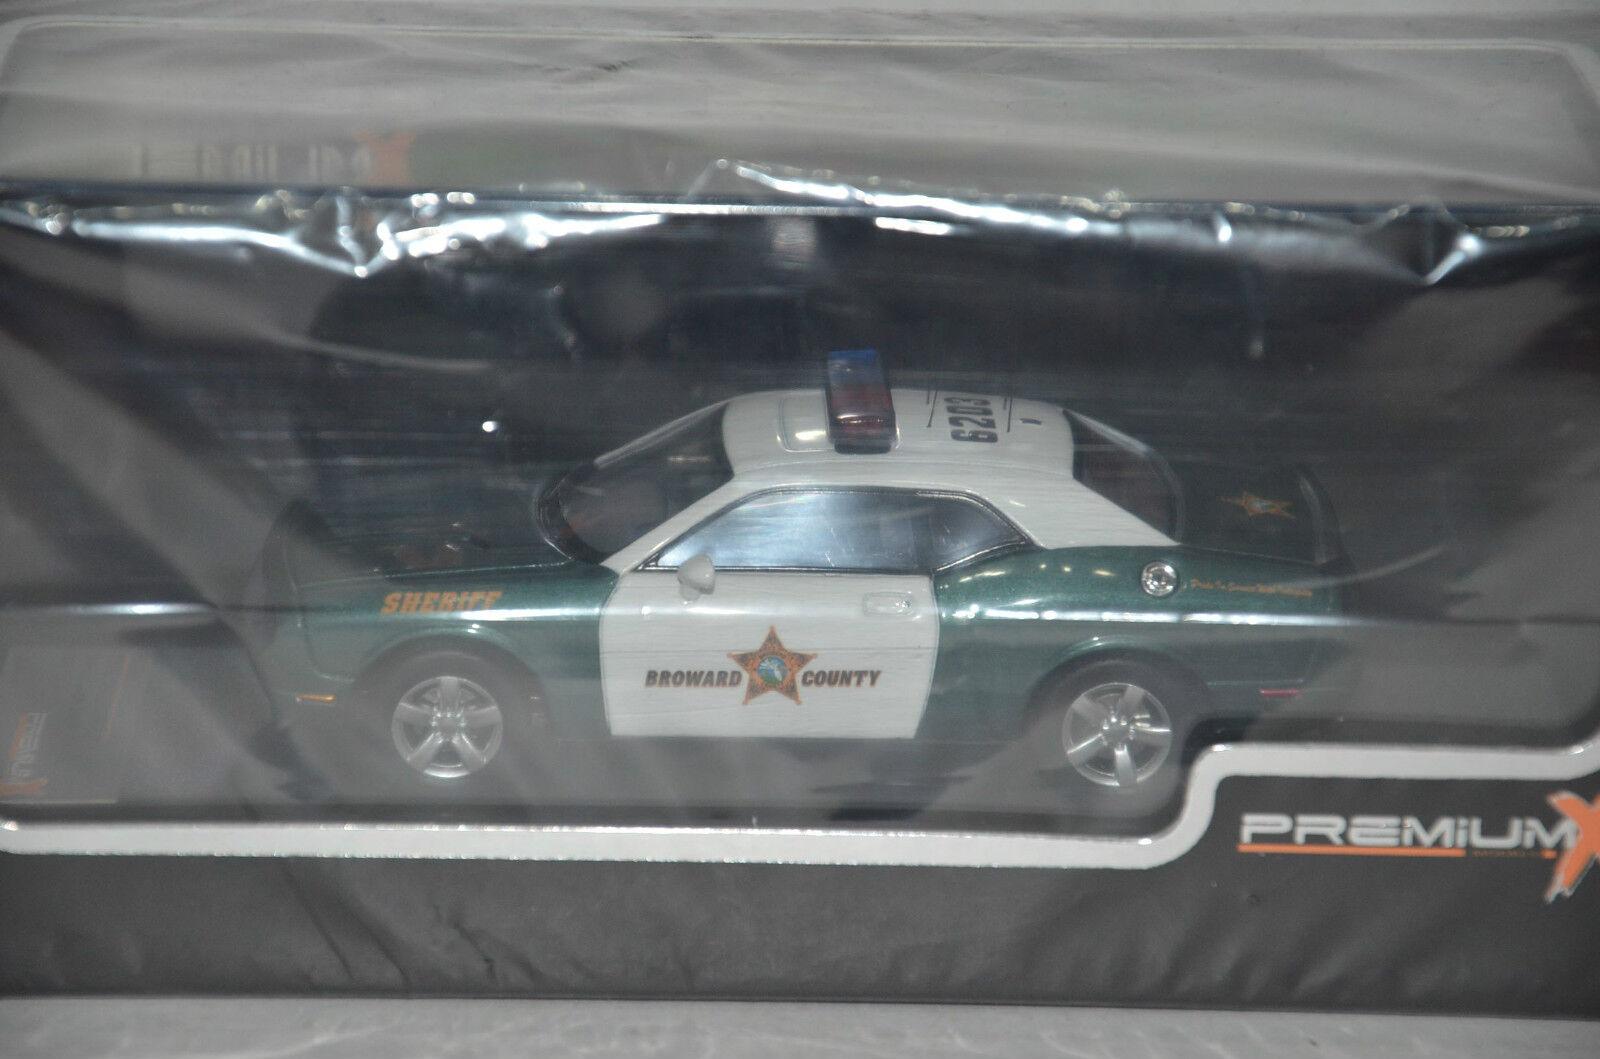 Dodge Challenger R T Police Sheriff PremiumX 2009 1 43